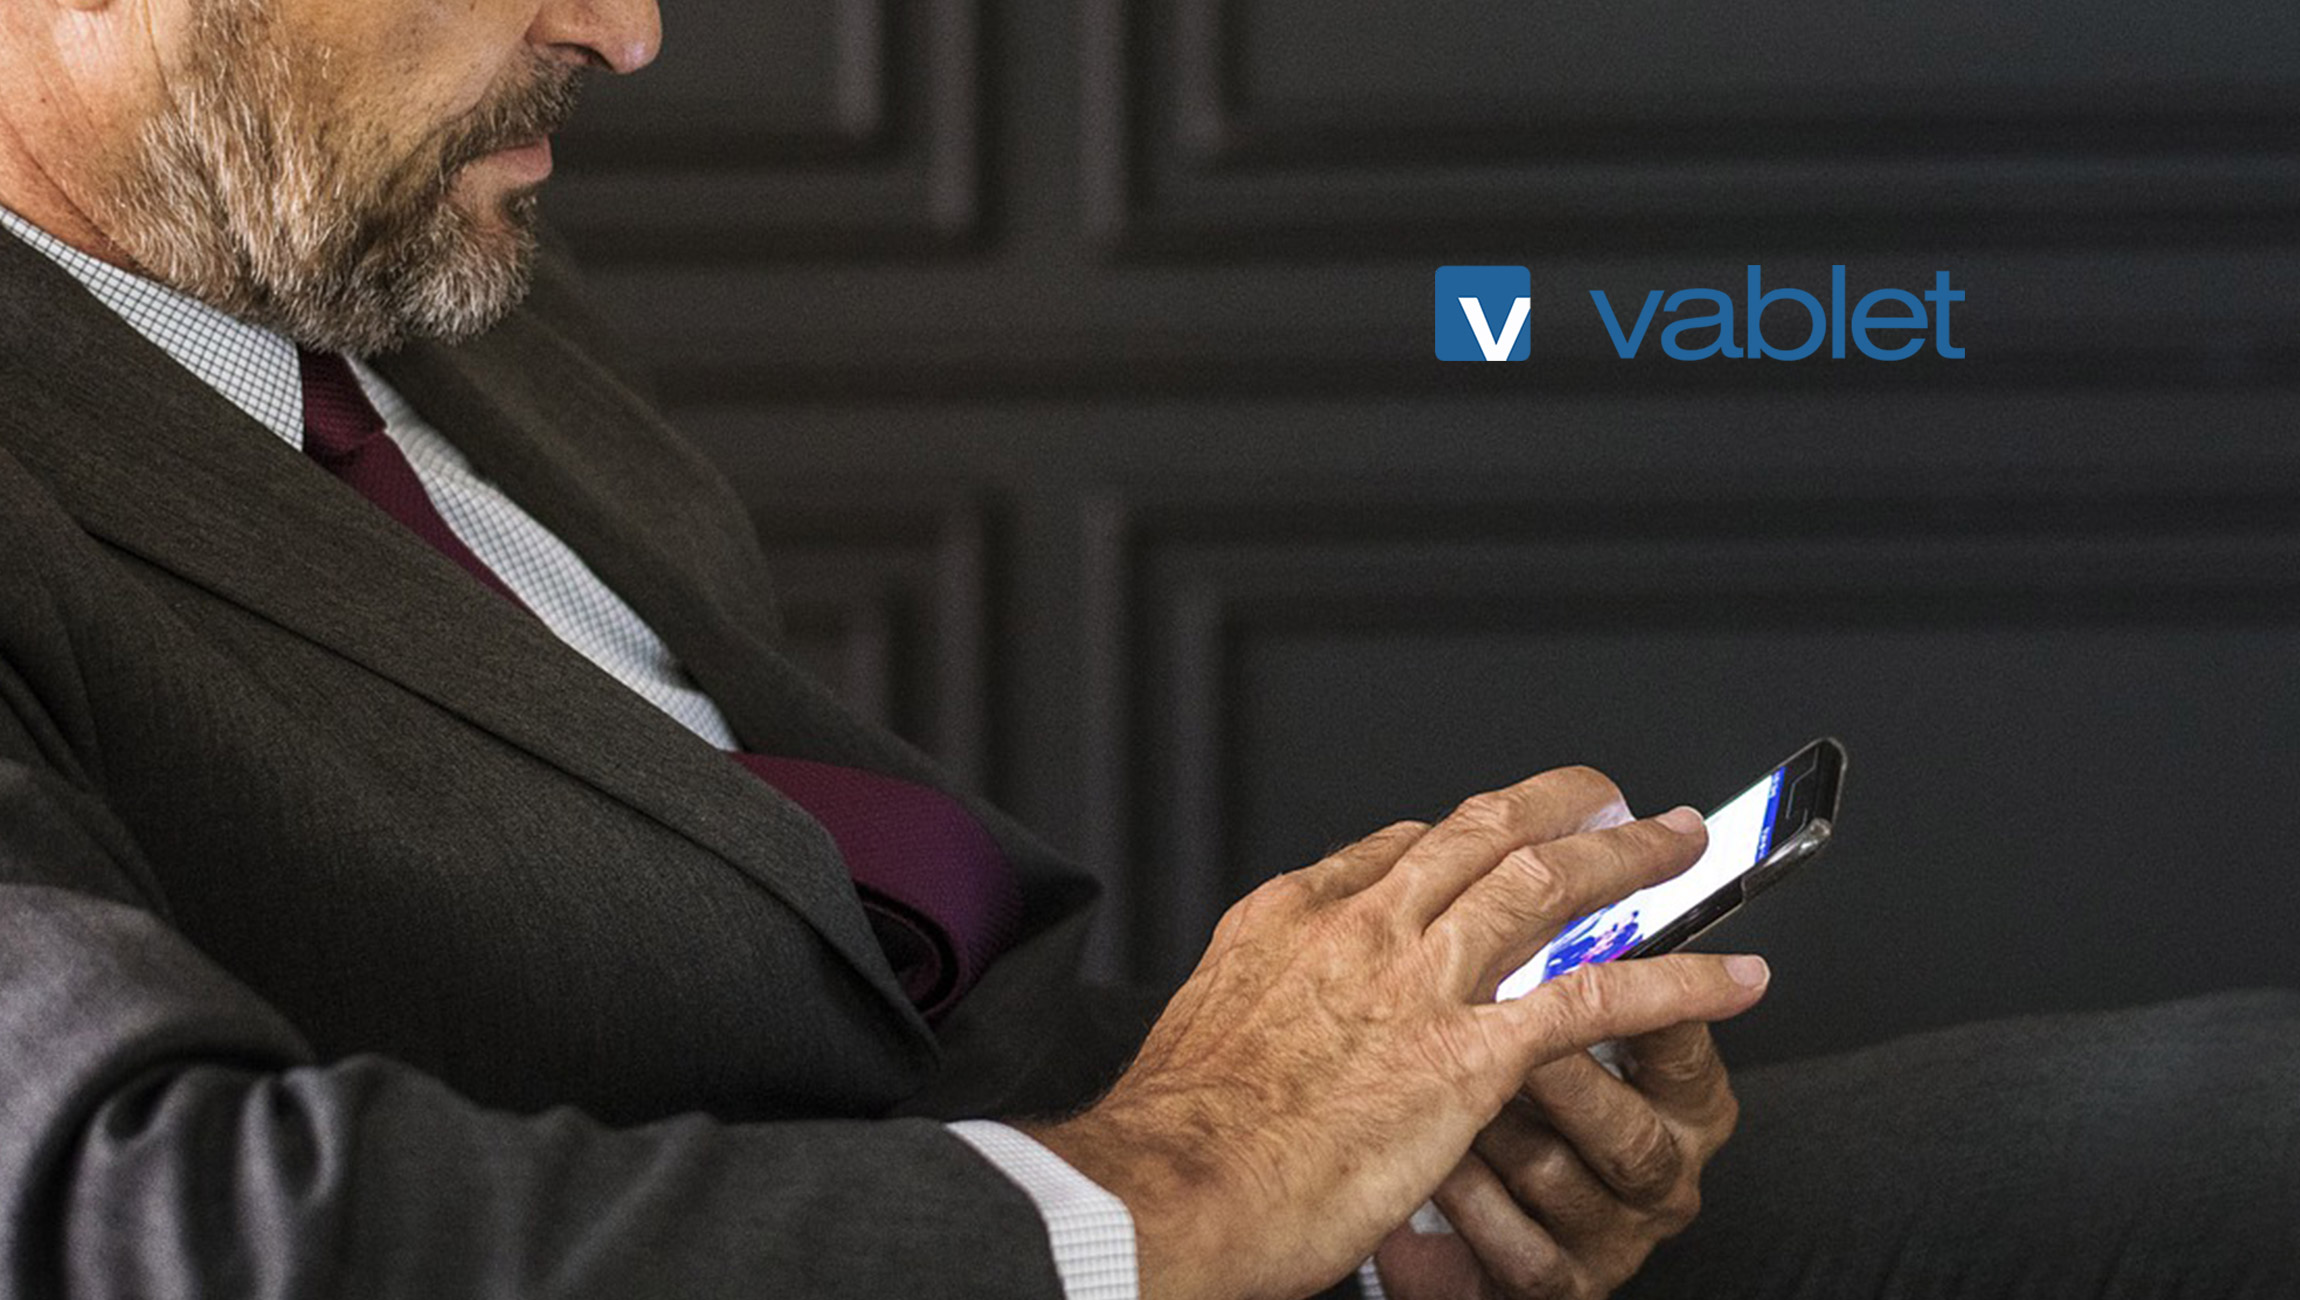 vablet Adds Social Media File Sharing Capabilities